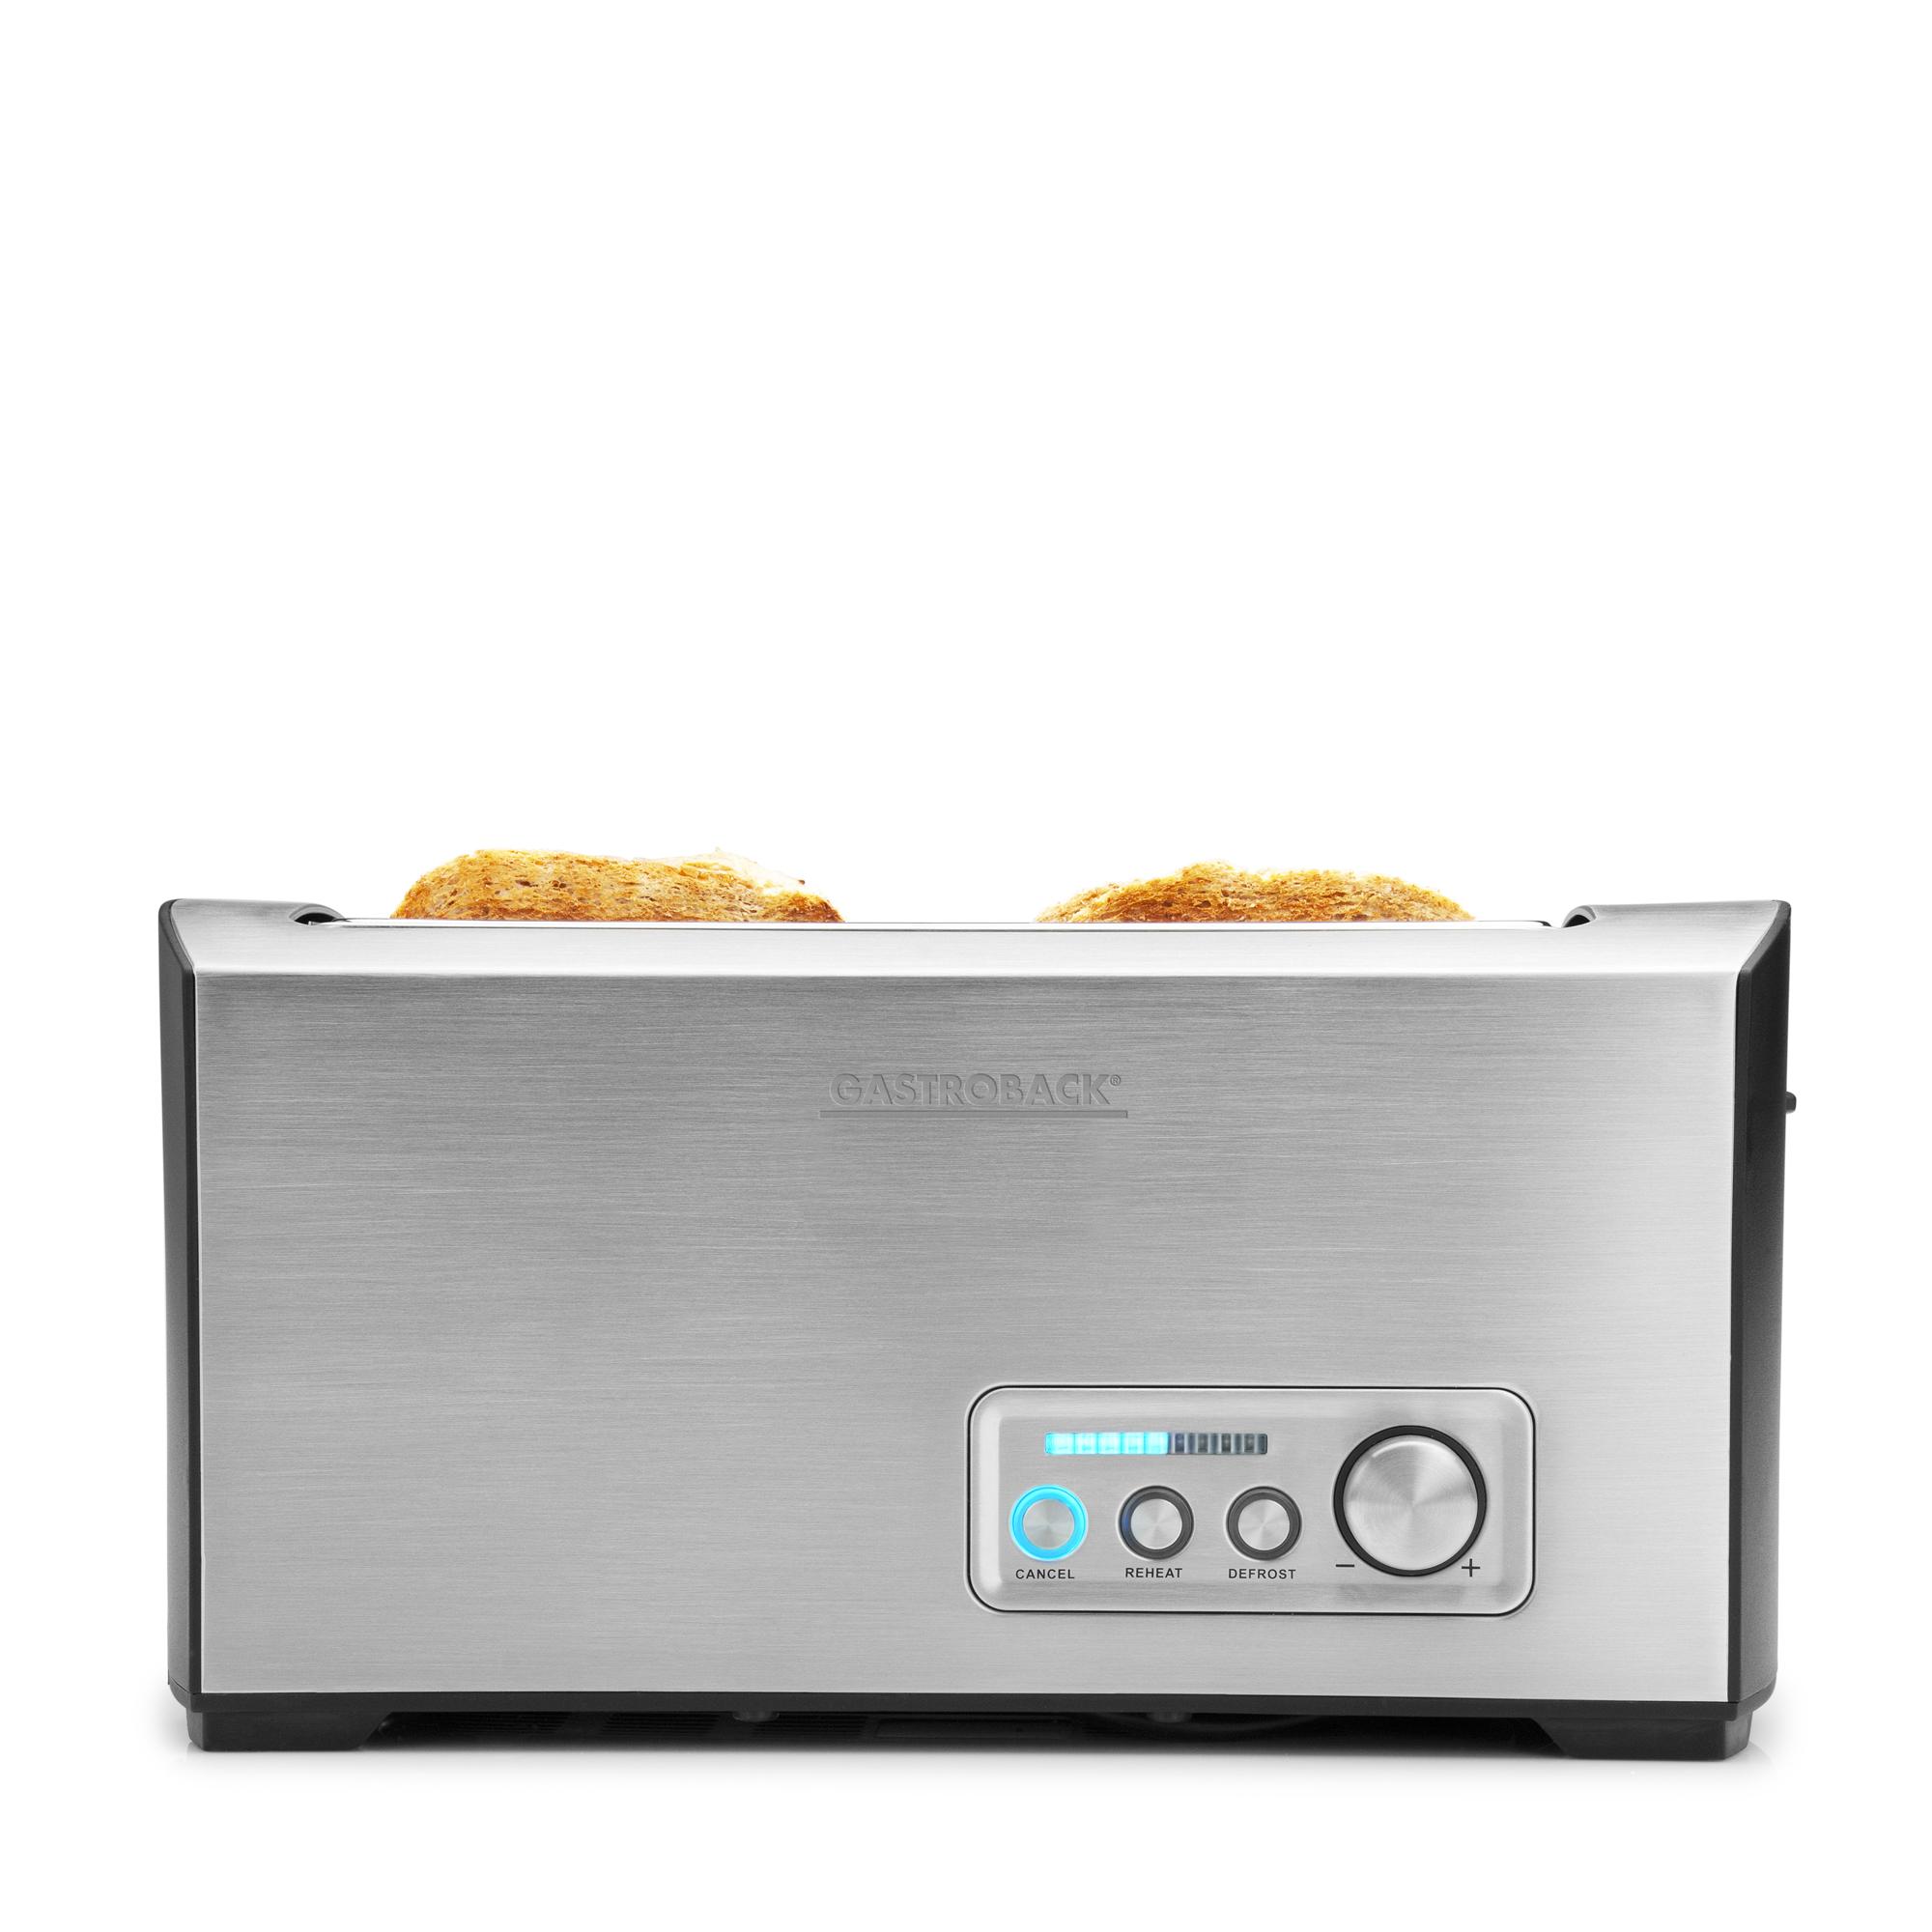 design toaster pro 4s toaster backen kochen backen. Black Bedroom Furniture Sets. Home Design Ideas